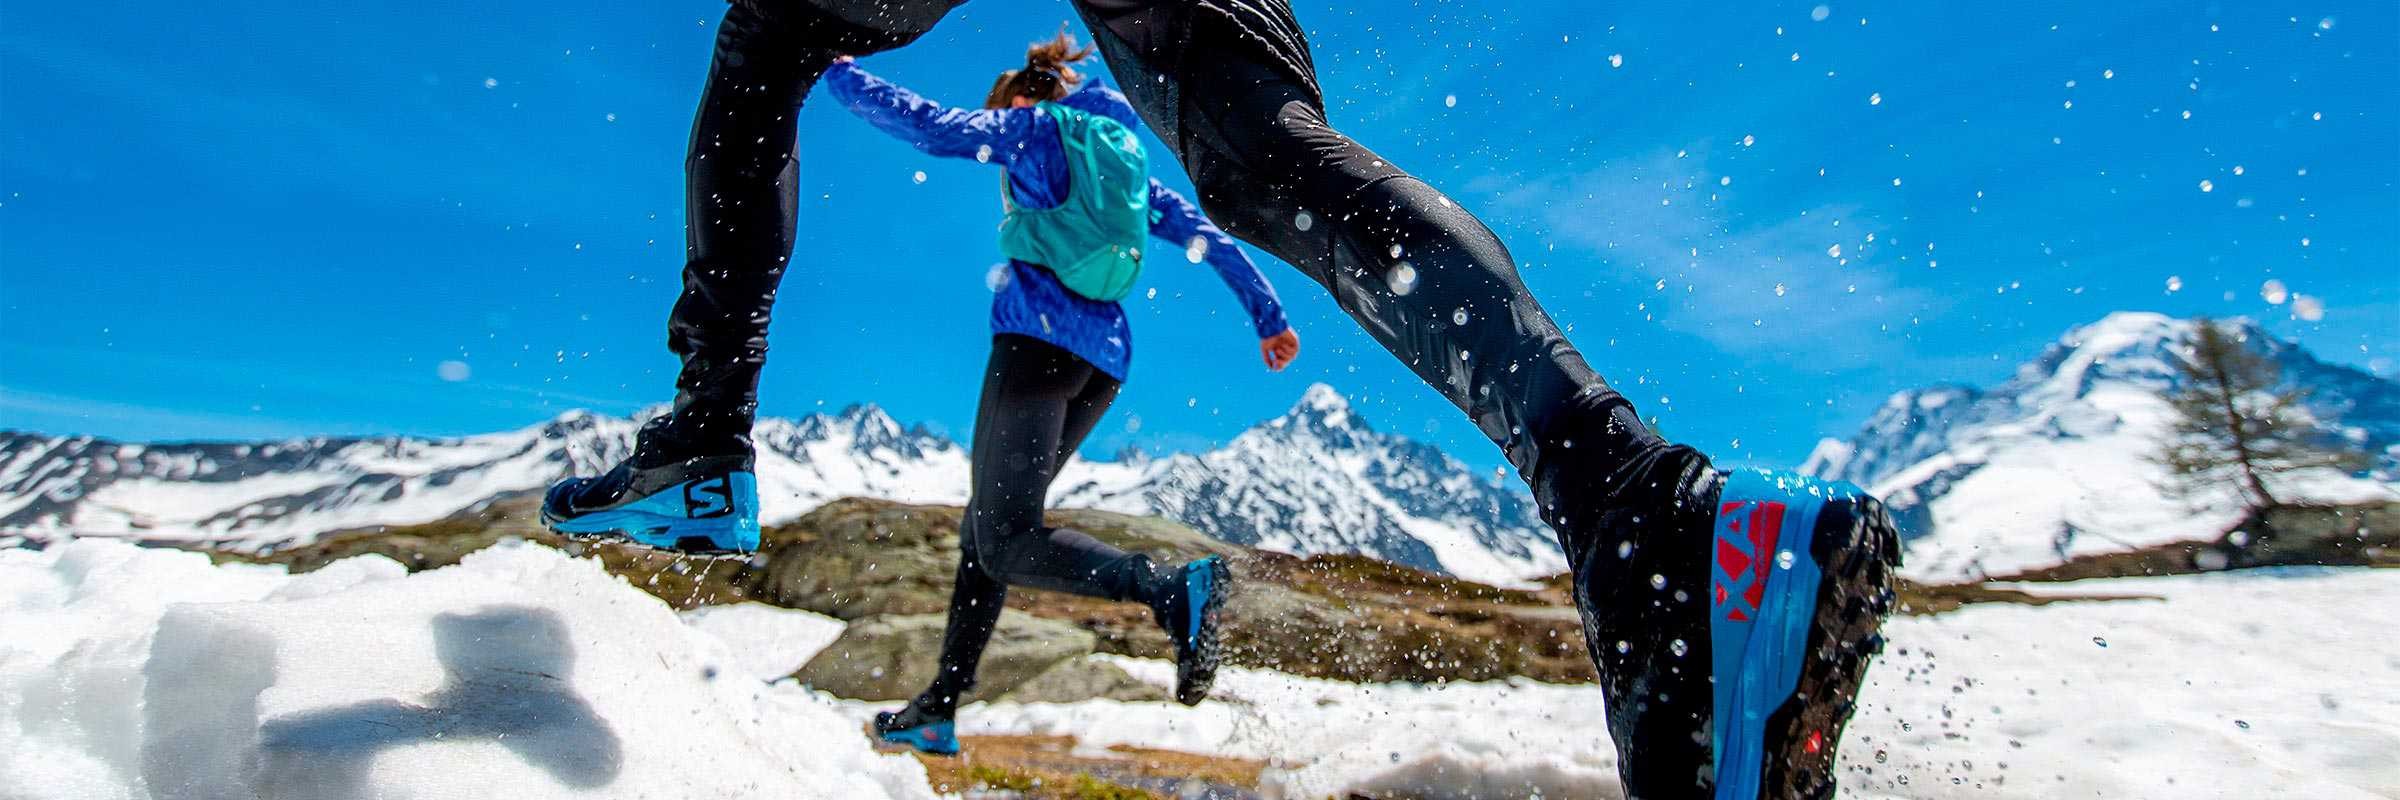 AccessoriesAltitude Running 7 Winter Blog Essential Top WHYeIE2D9